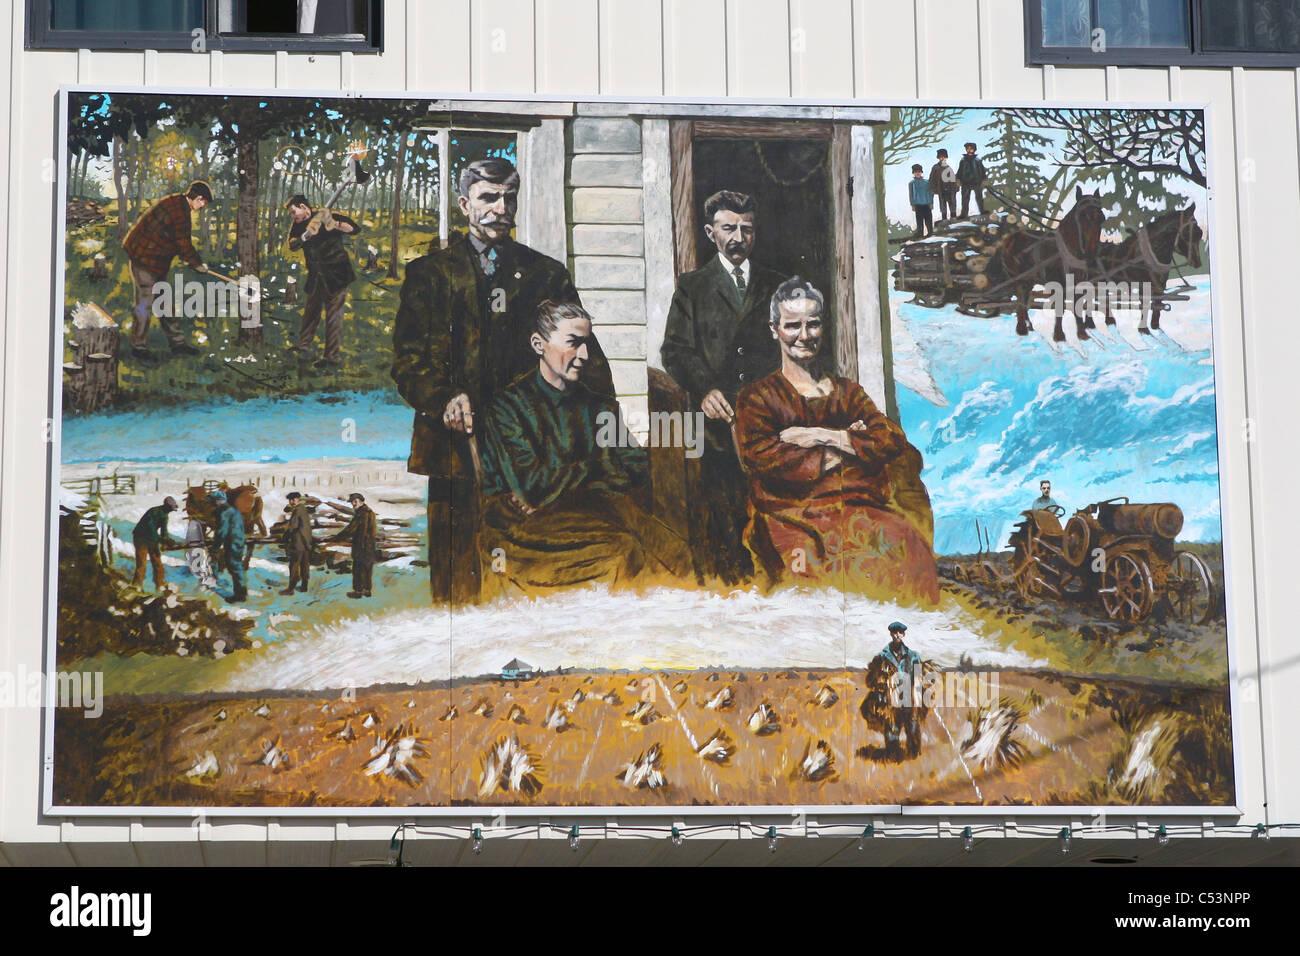 Wandbilder bei rechts-, Alberta, Kanada Kunst Malerei Wand Dekorationen künstlerisch kreative phantasievolle arty Stockfoto